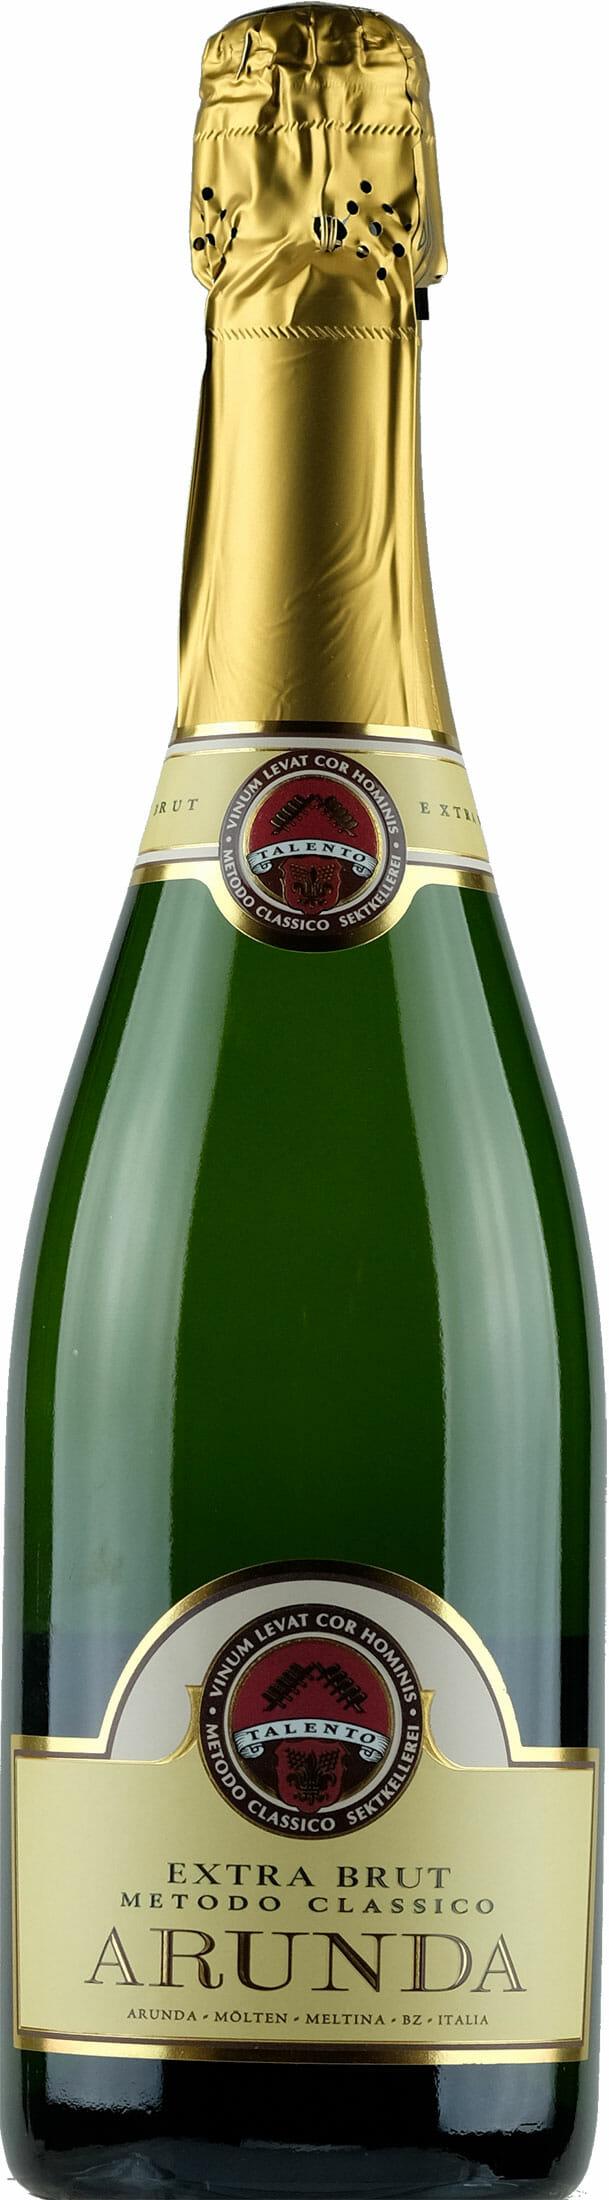 , ARUNDA, The High Life – Europe's highest sparkling winery, Saubio Making Wealth